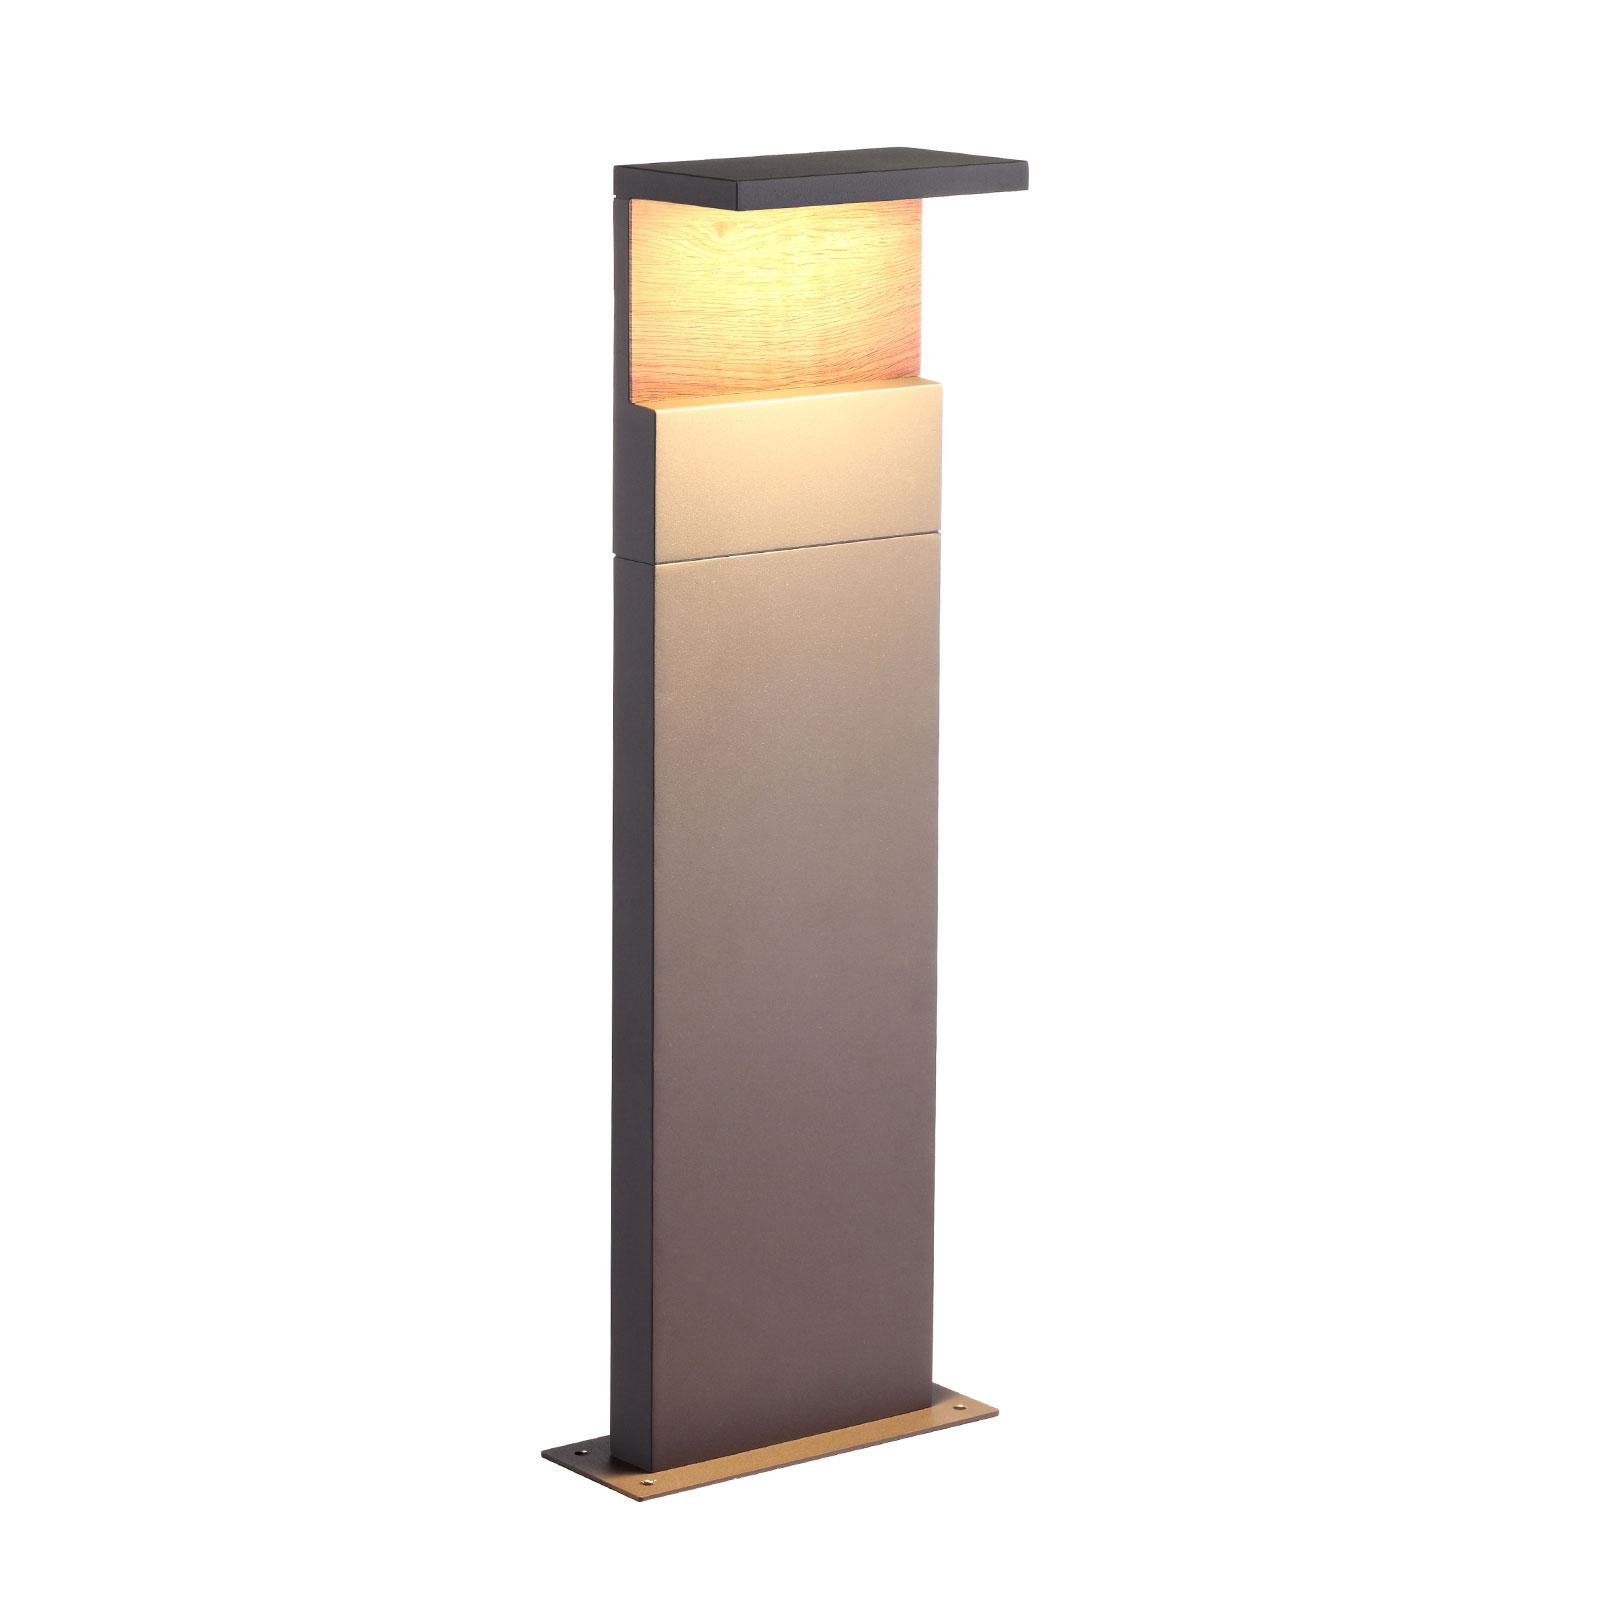 LED-Wegeleuchte Ruka mit Holz-Element, 60 cm